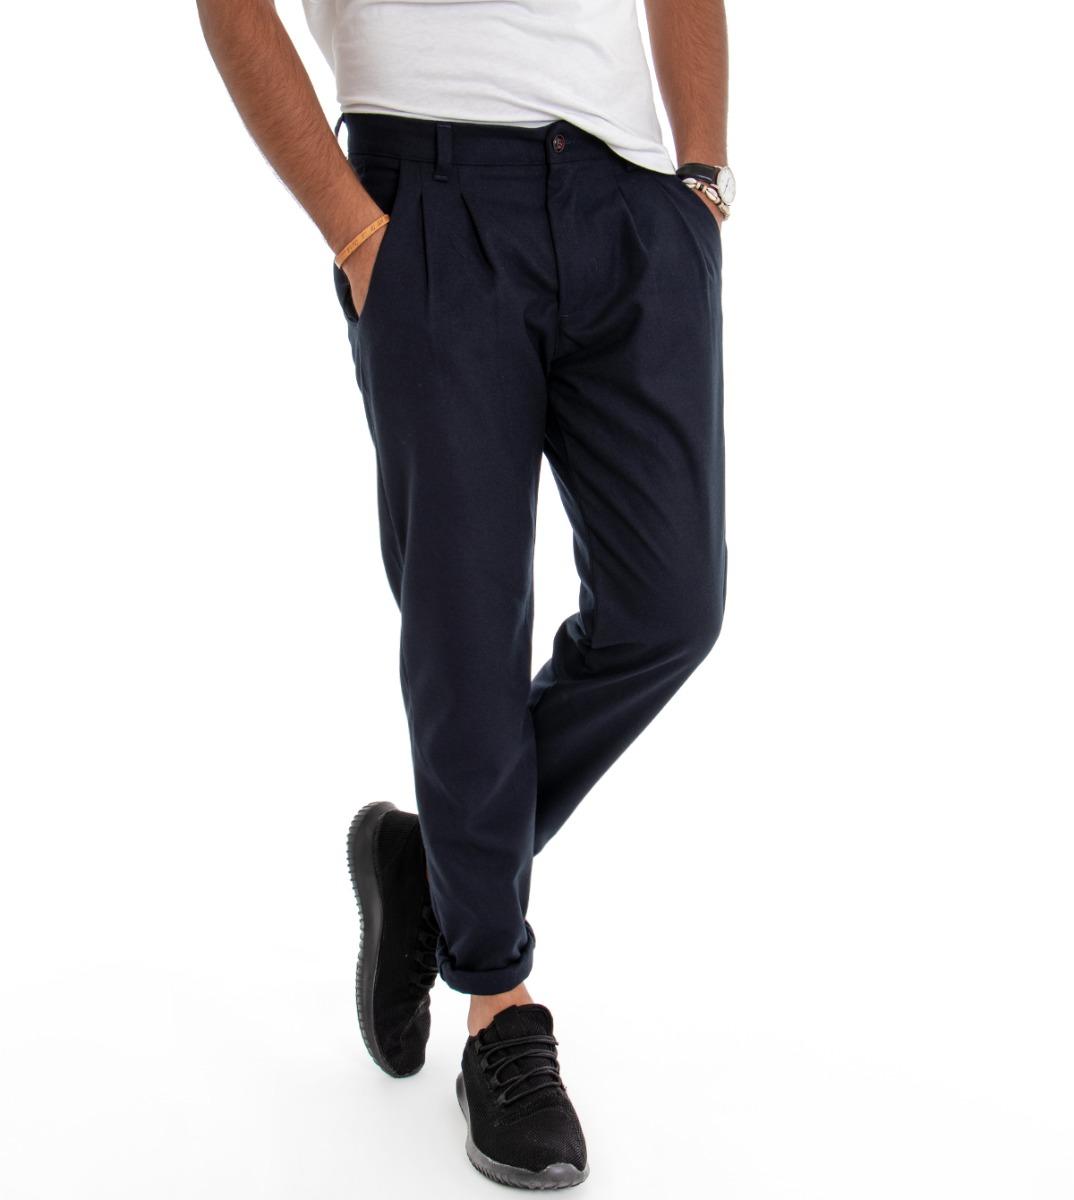 Pantalone-Uomo-con-Pence-Tasca-America-Blu-Tinta-Unita-Cavallo-Basso-Regular